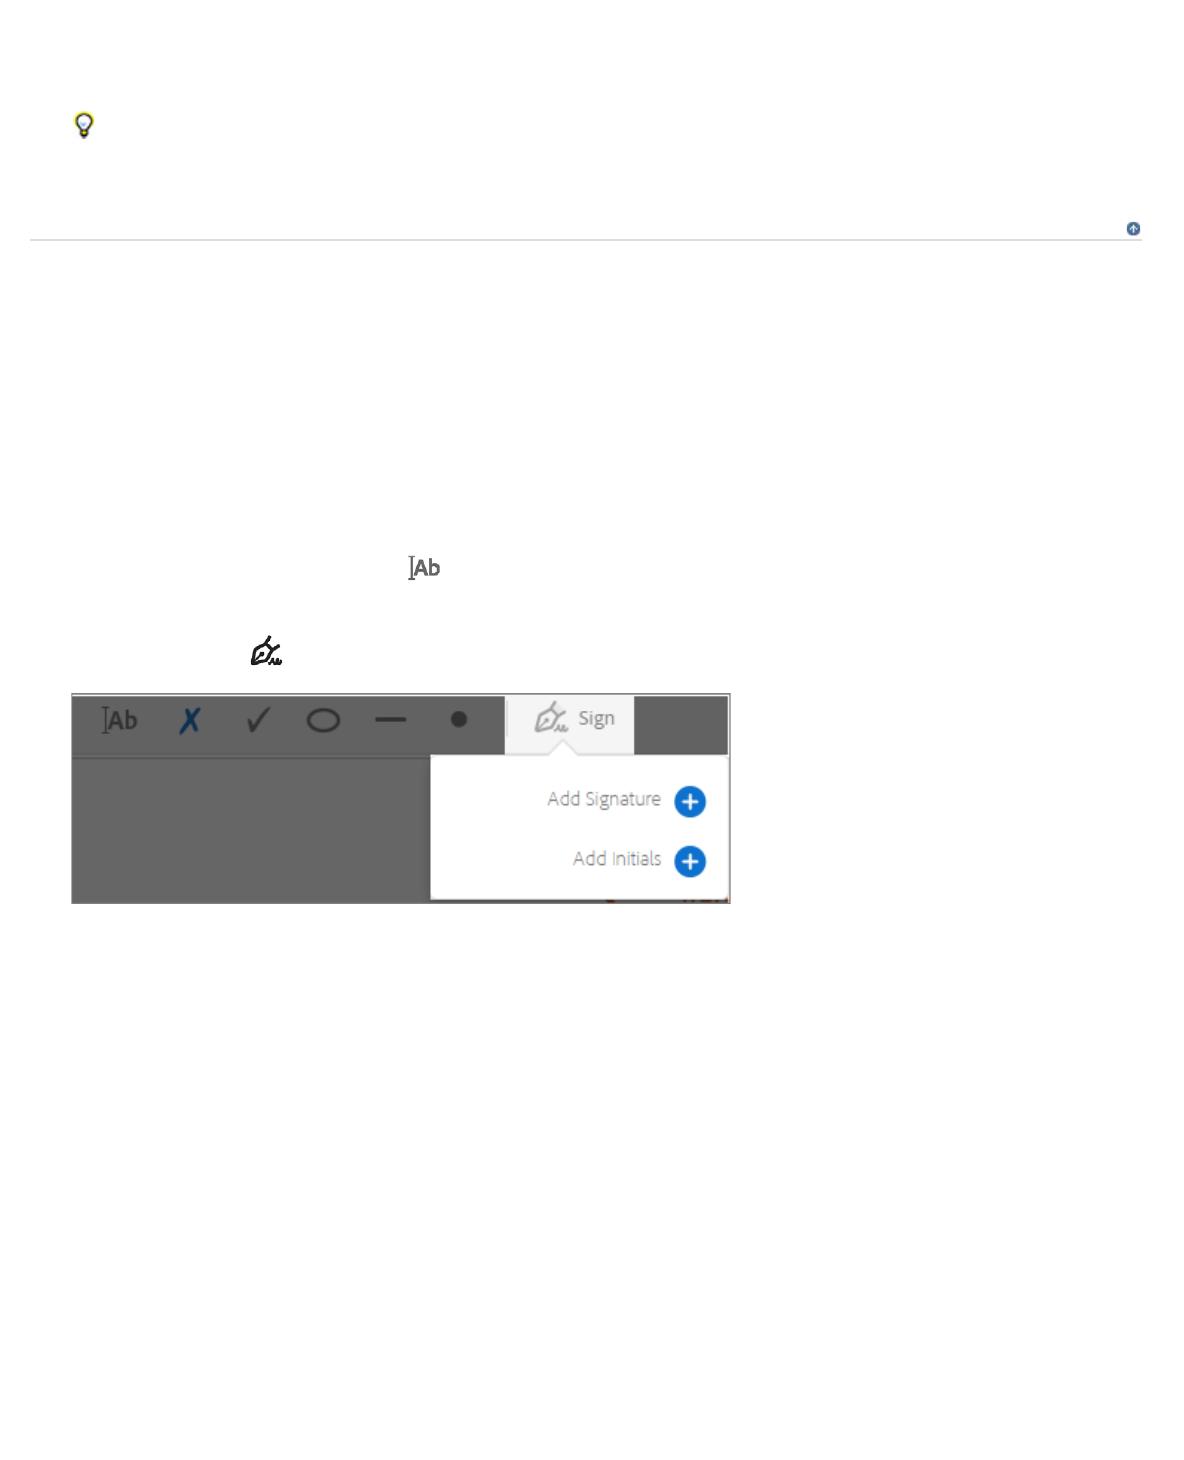 Handleiding Adobe ACROBAT READER DC - 2015 (pagina 24 van 35